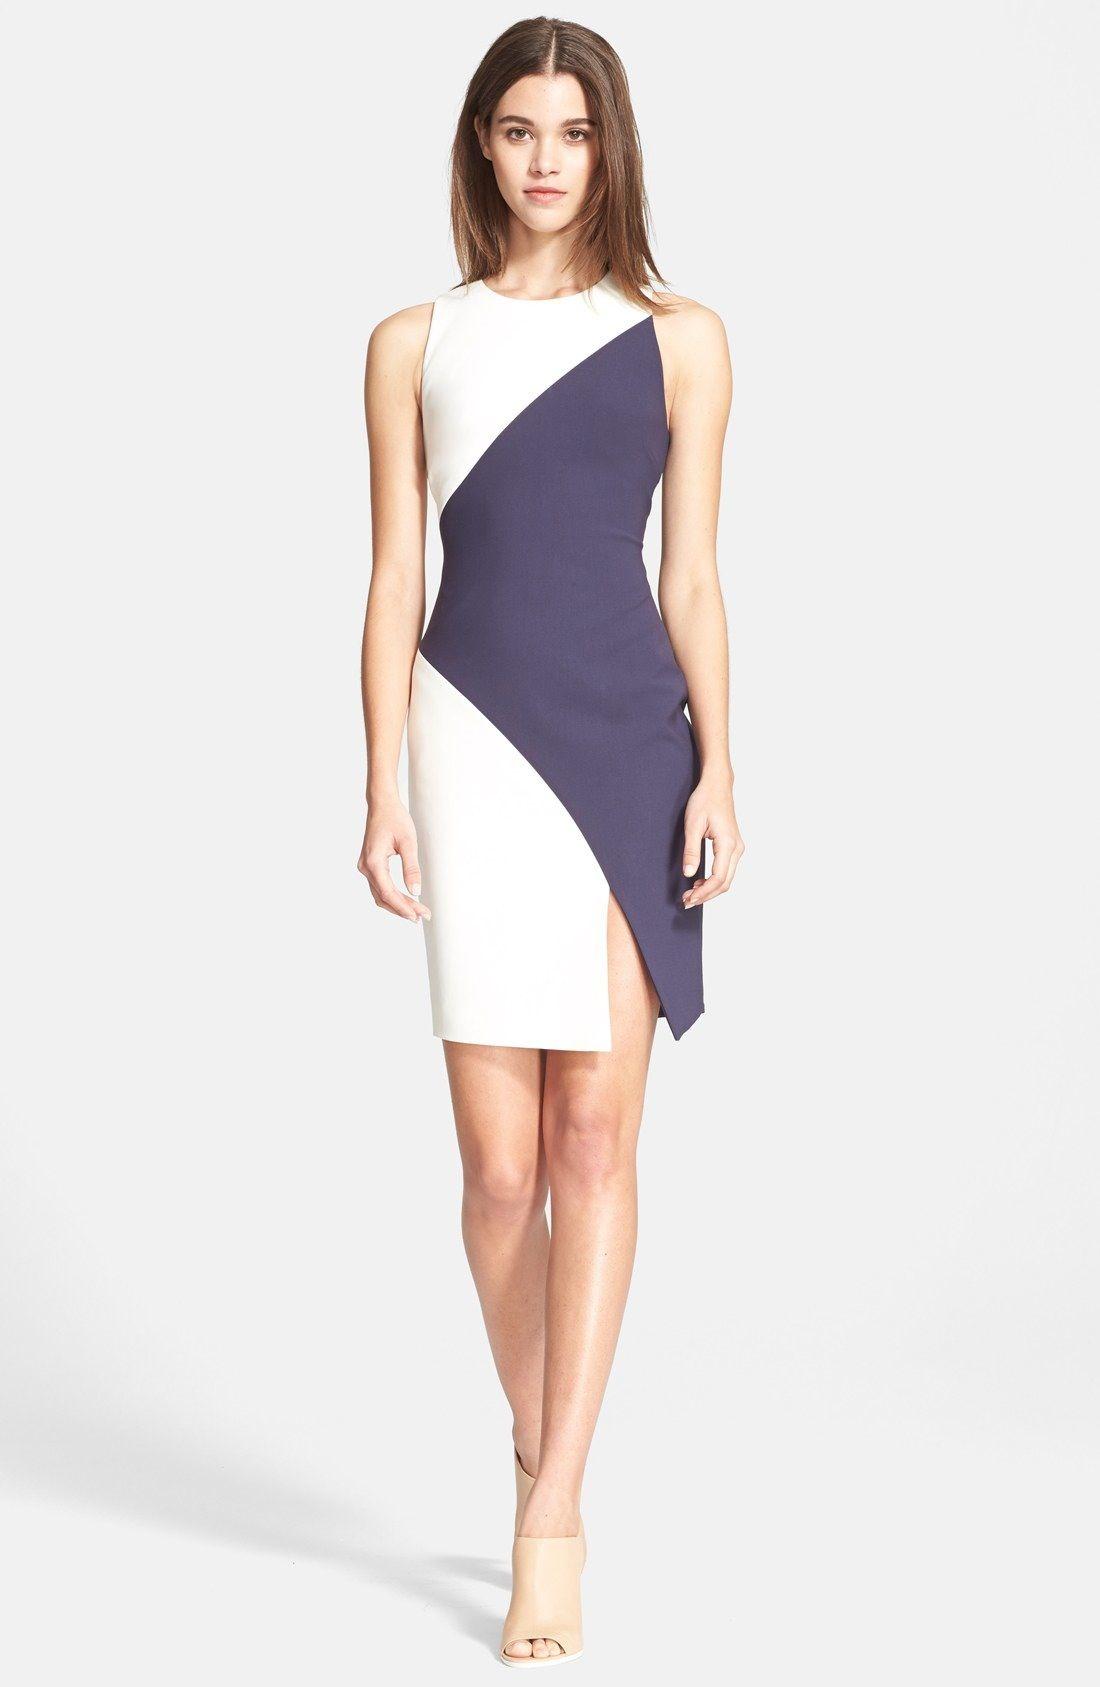 Lace dress midi march 2019 Elizabeth and James uKleinu Colorblock Stretch Knit Dress available